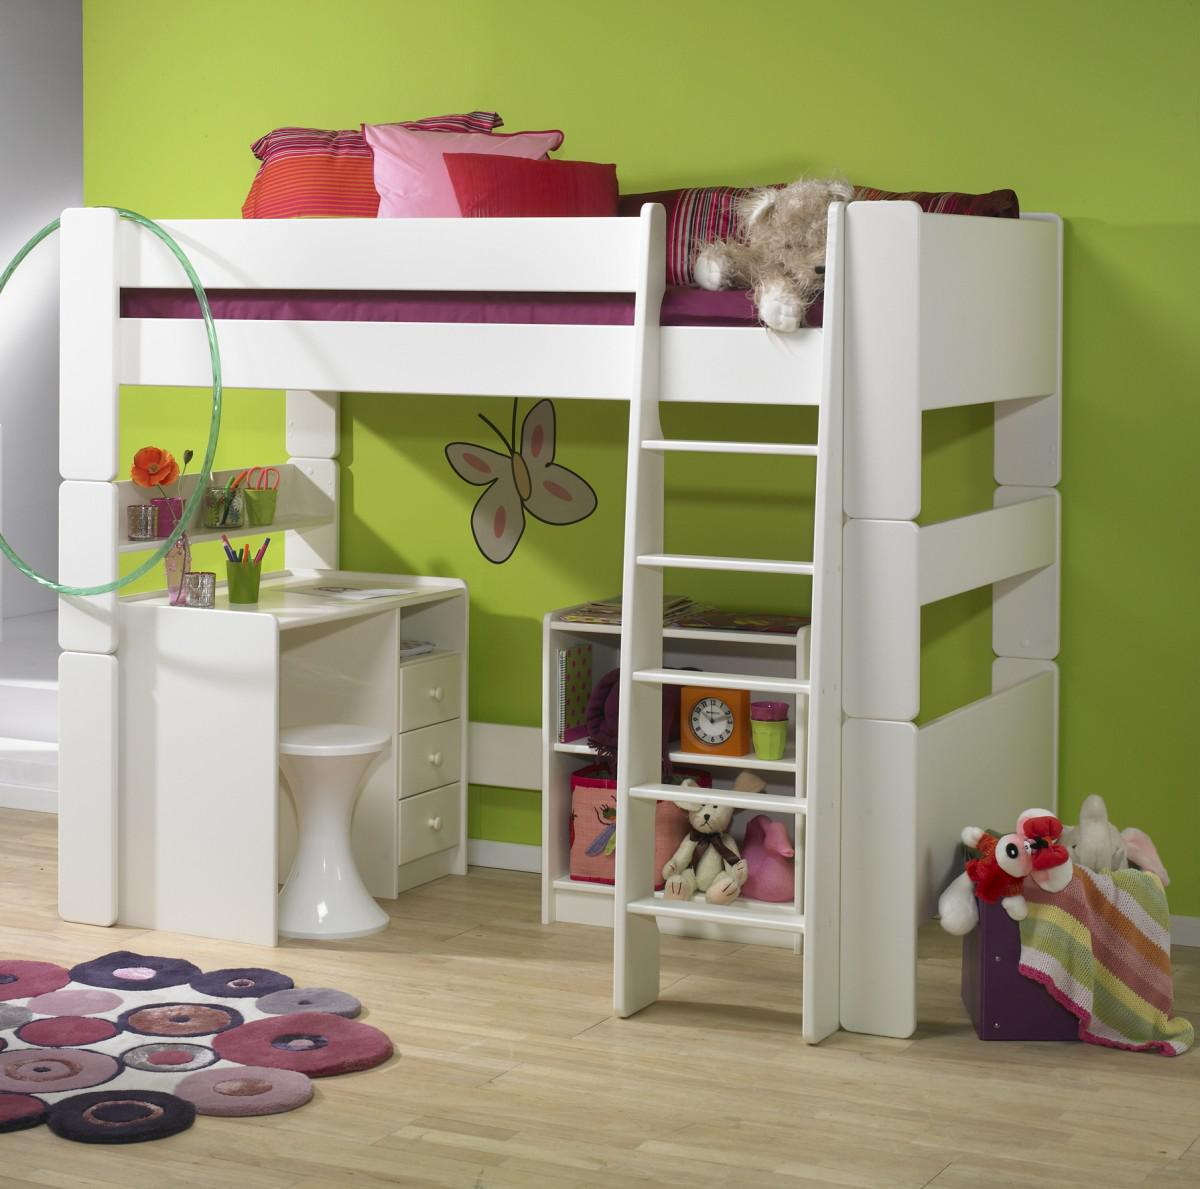 Kinderzimmer Set MDF weiß lackiert Hochbett Bett Schreibtisch Regal ...